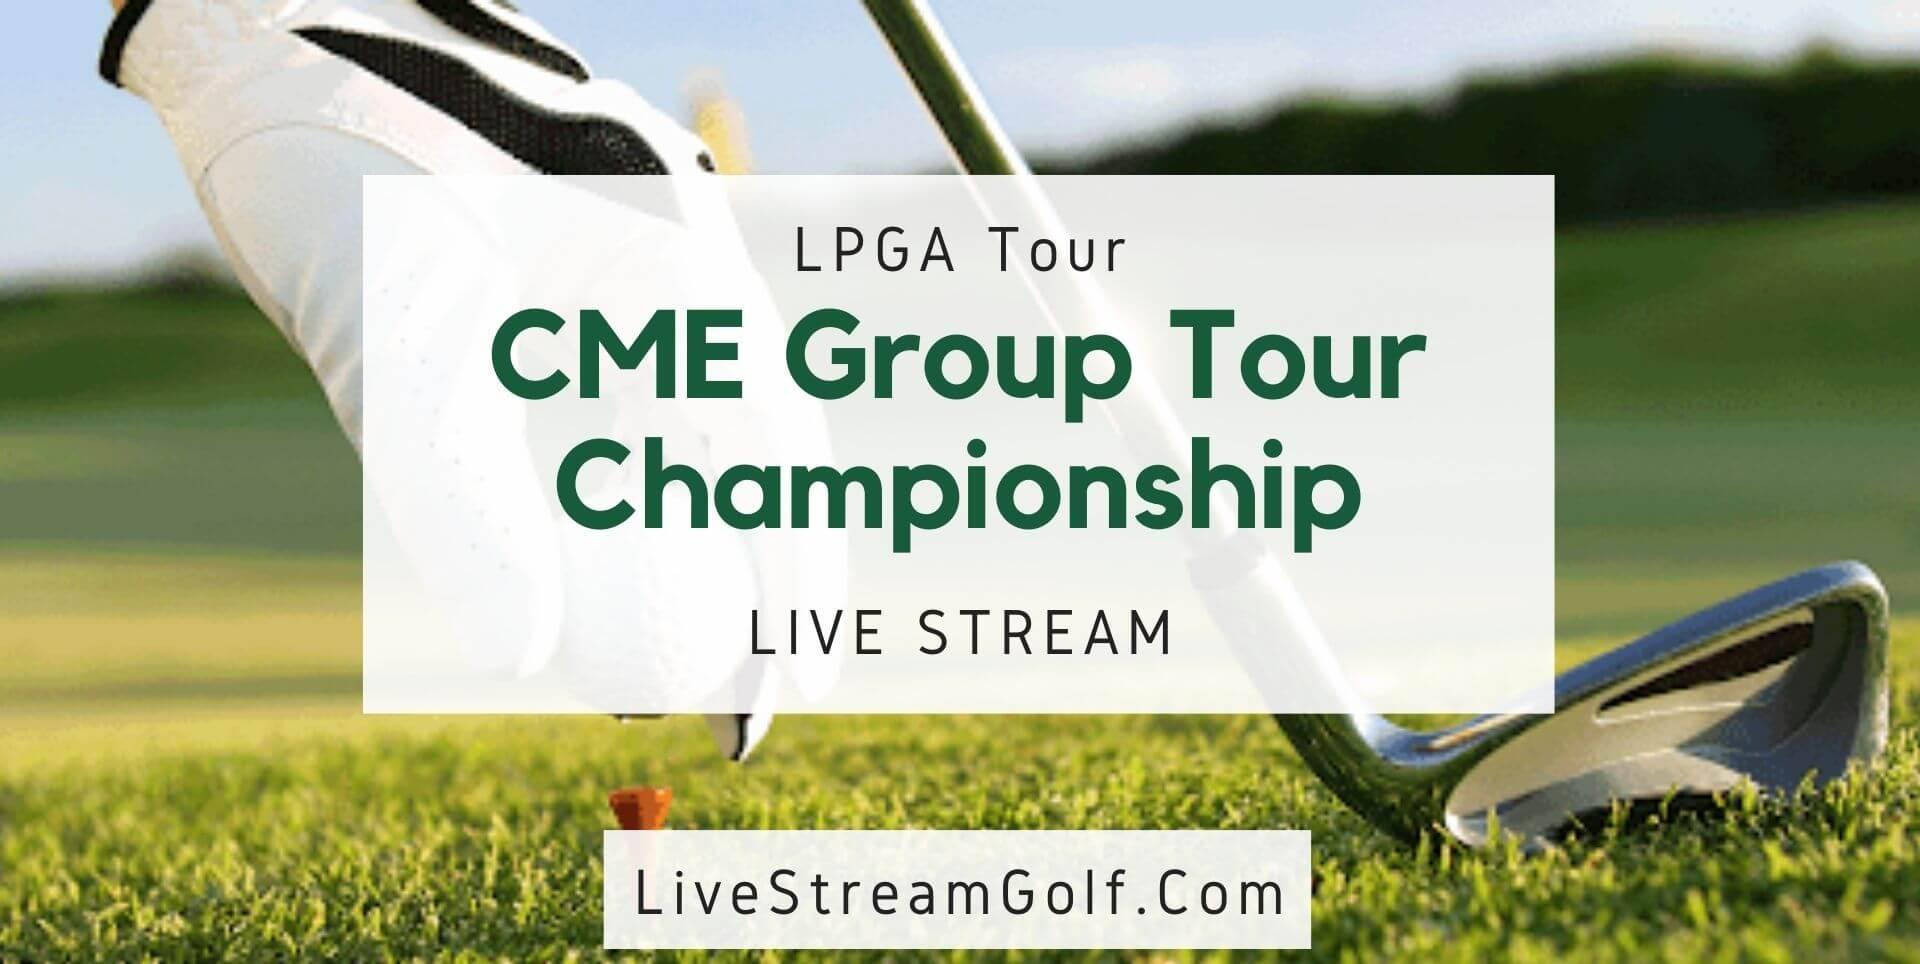 CME Group Tour Championship Rd 2 Live Stream: LPGA Tour 2021